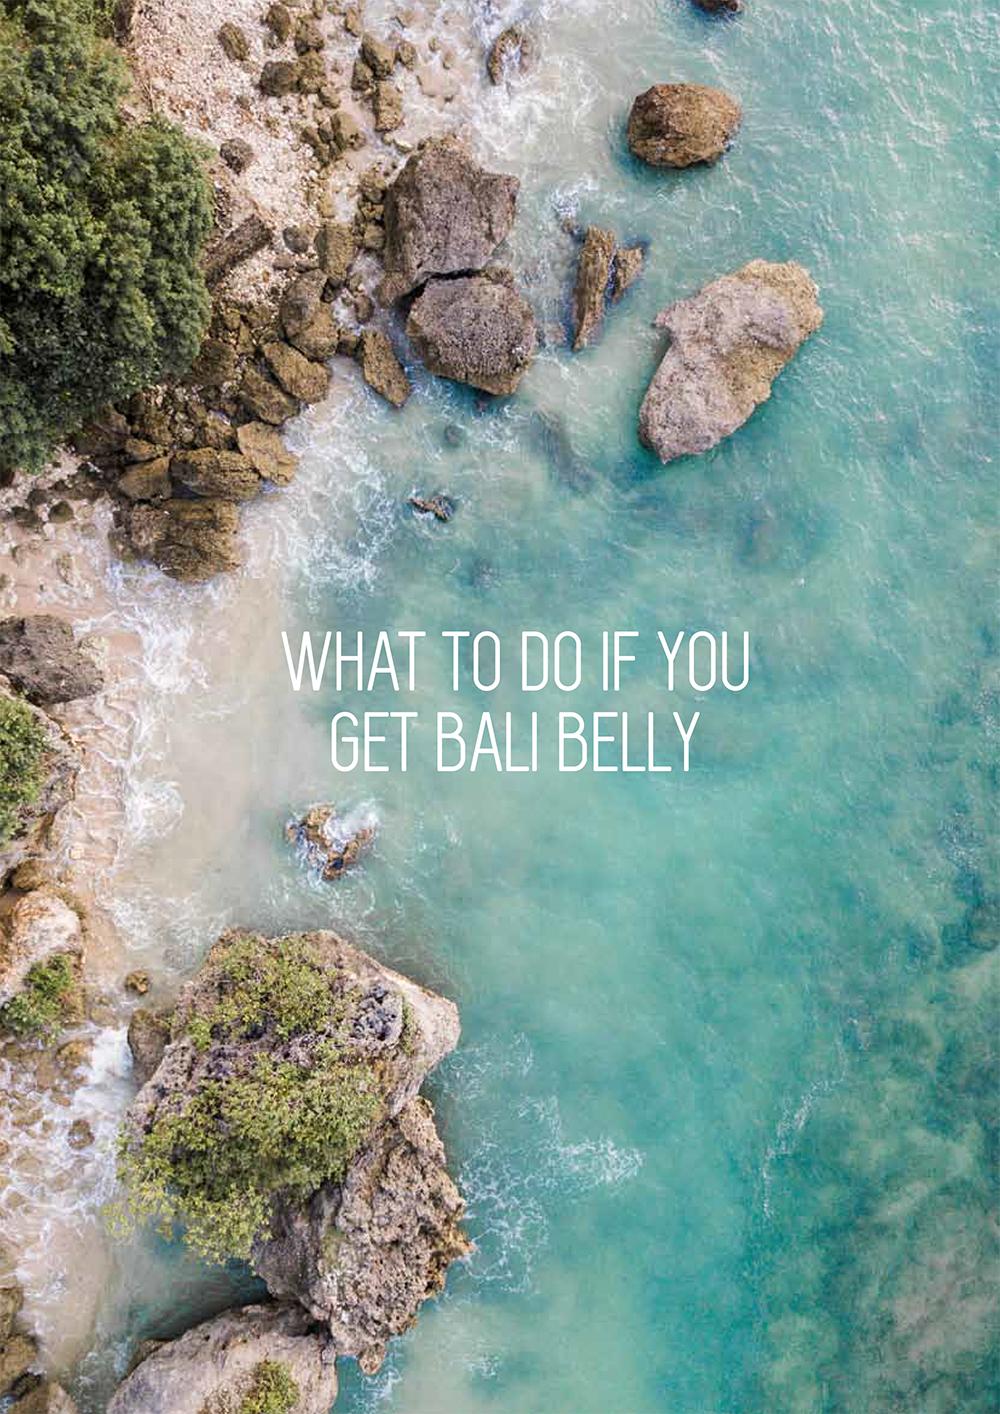 What to do if you get Bali belly-Jordan Pie-1.jpg